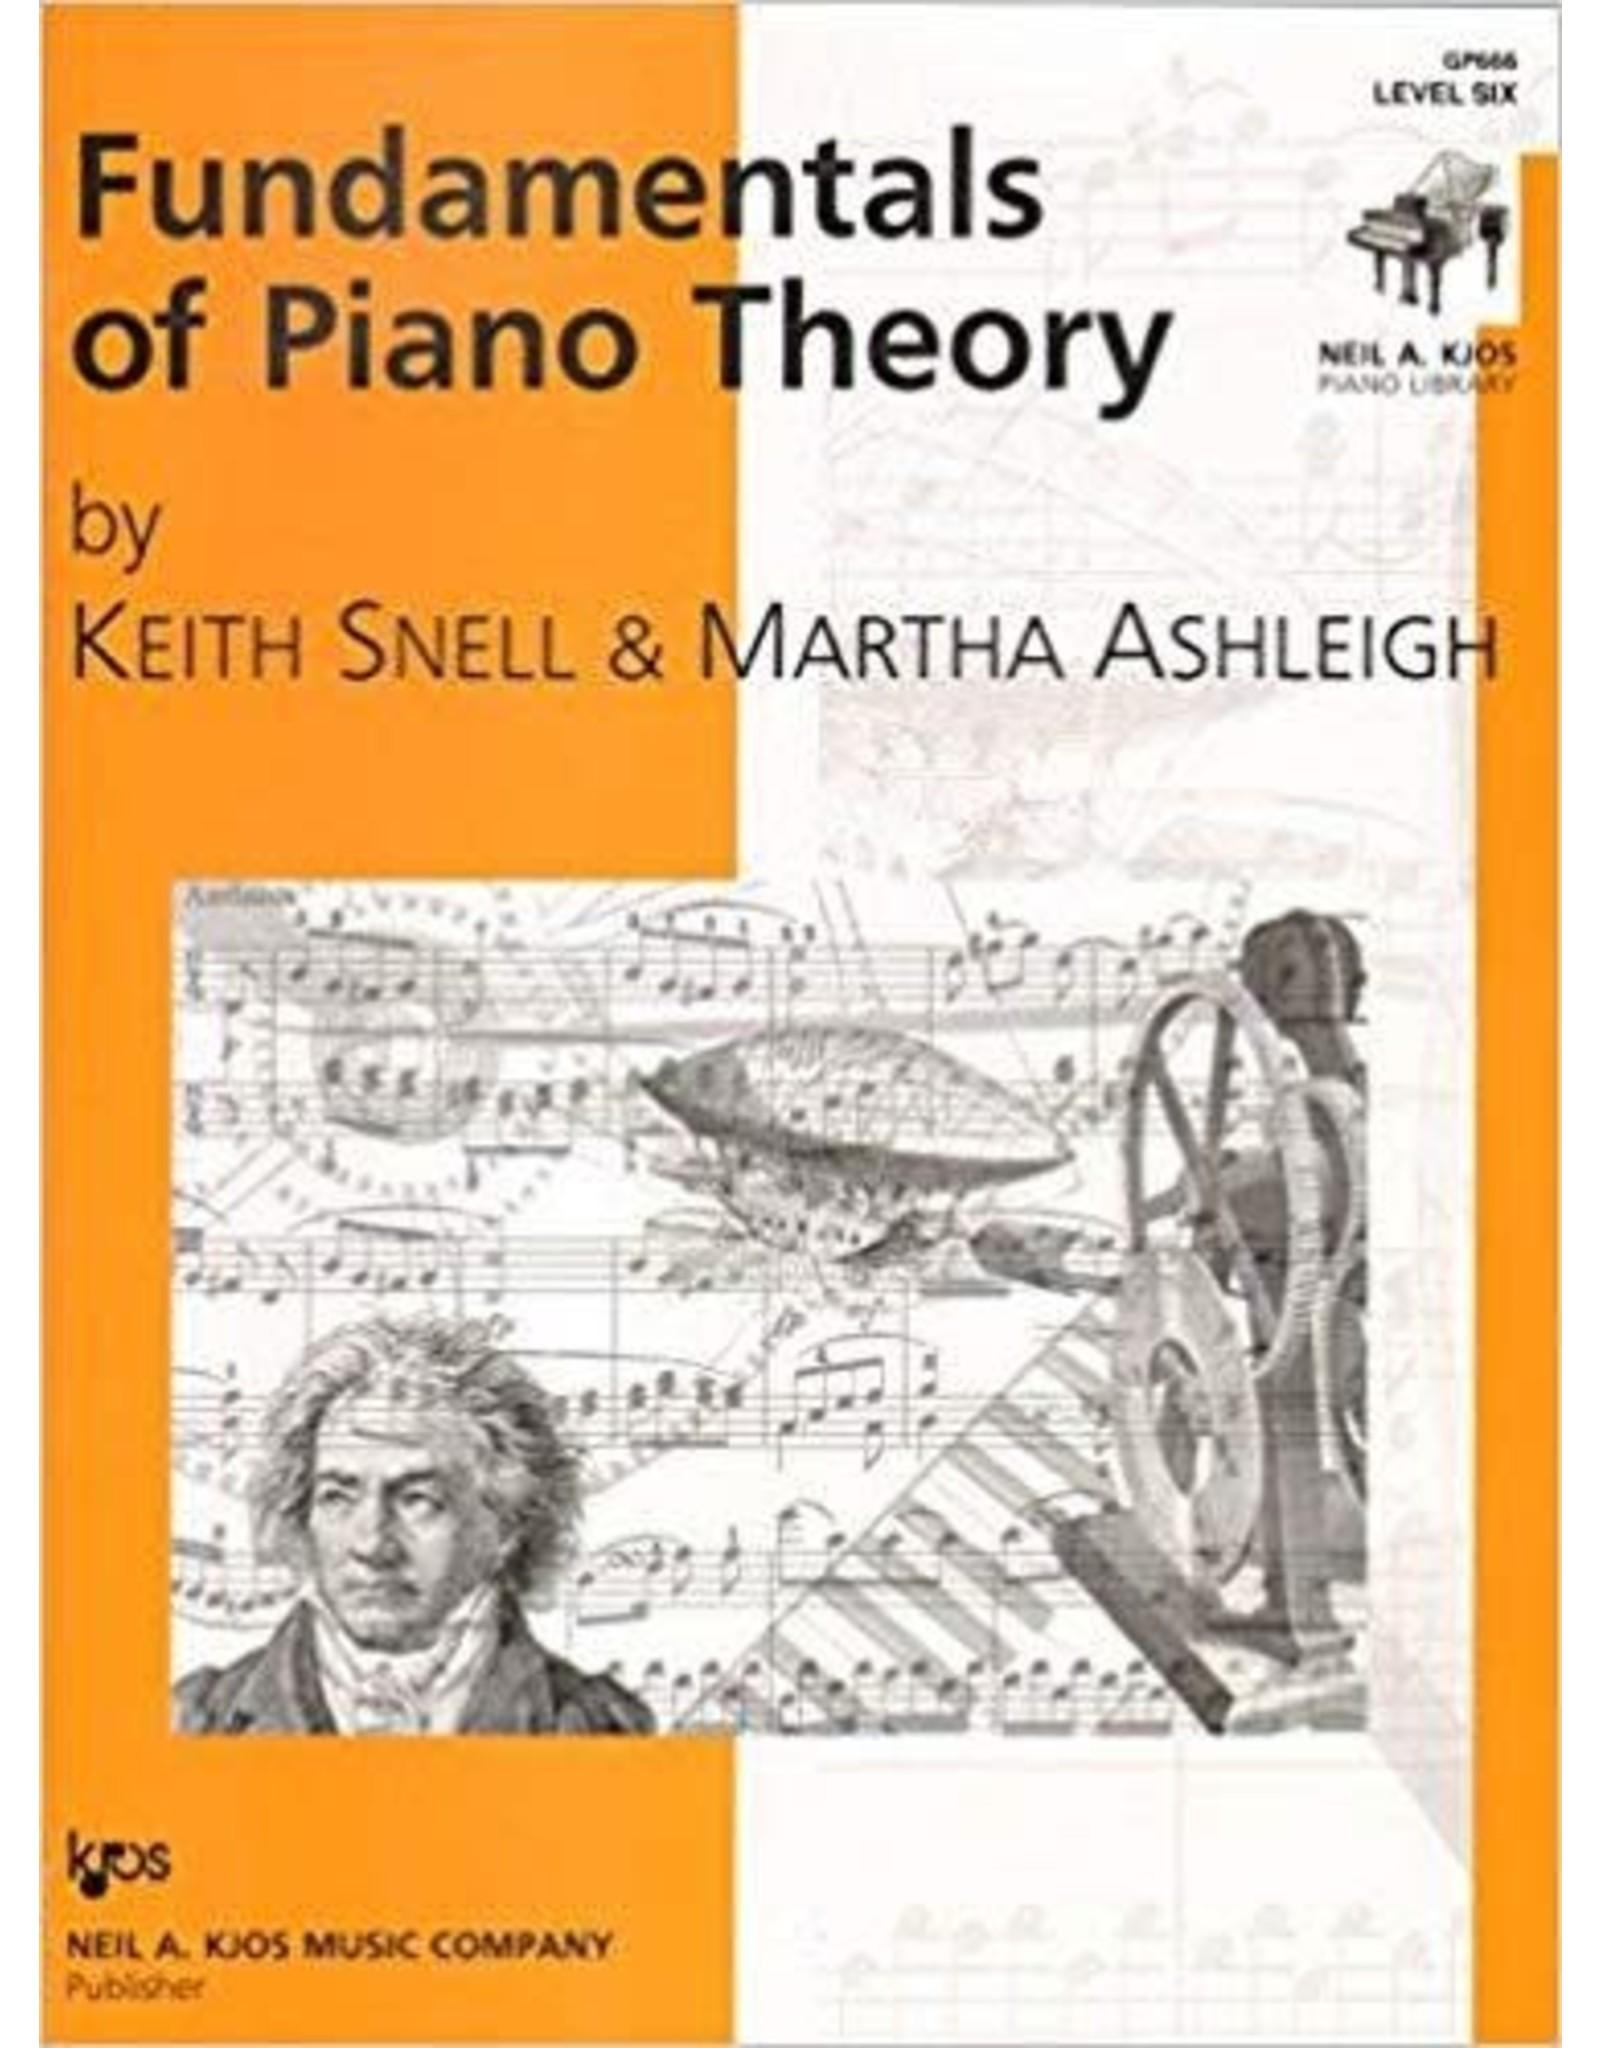 Kjos Fundamentals of Piano Theory, Level 6 Keith Snell